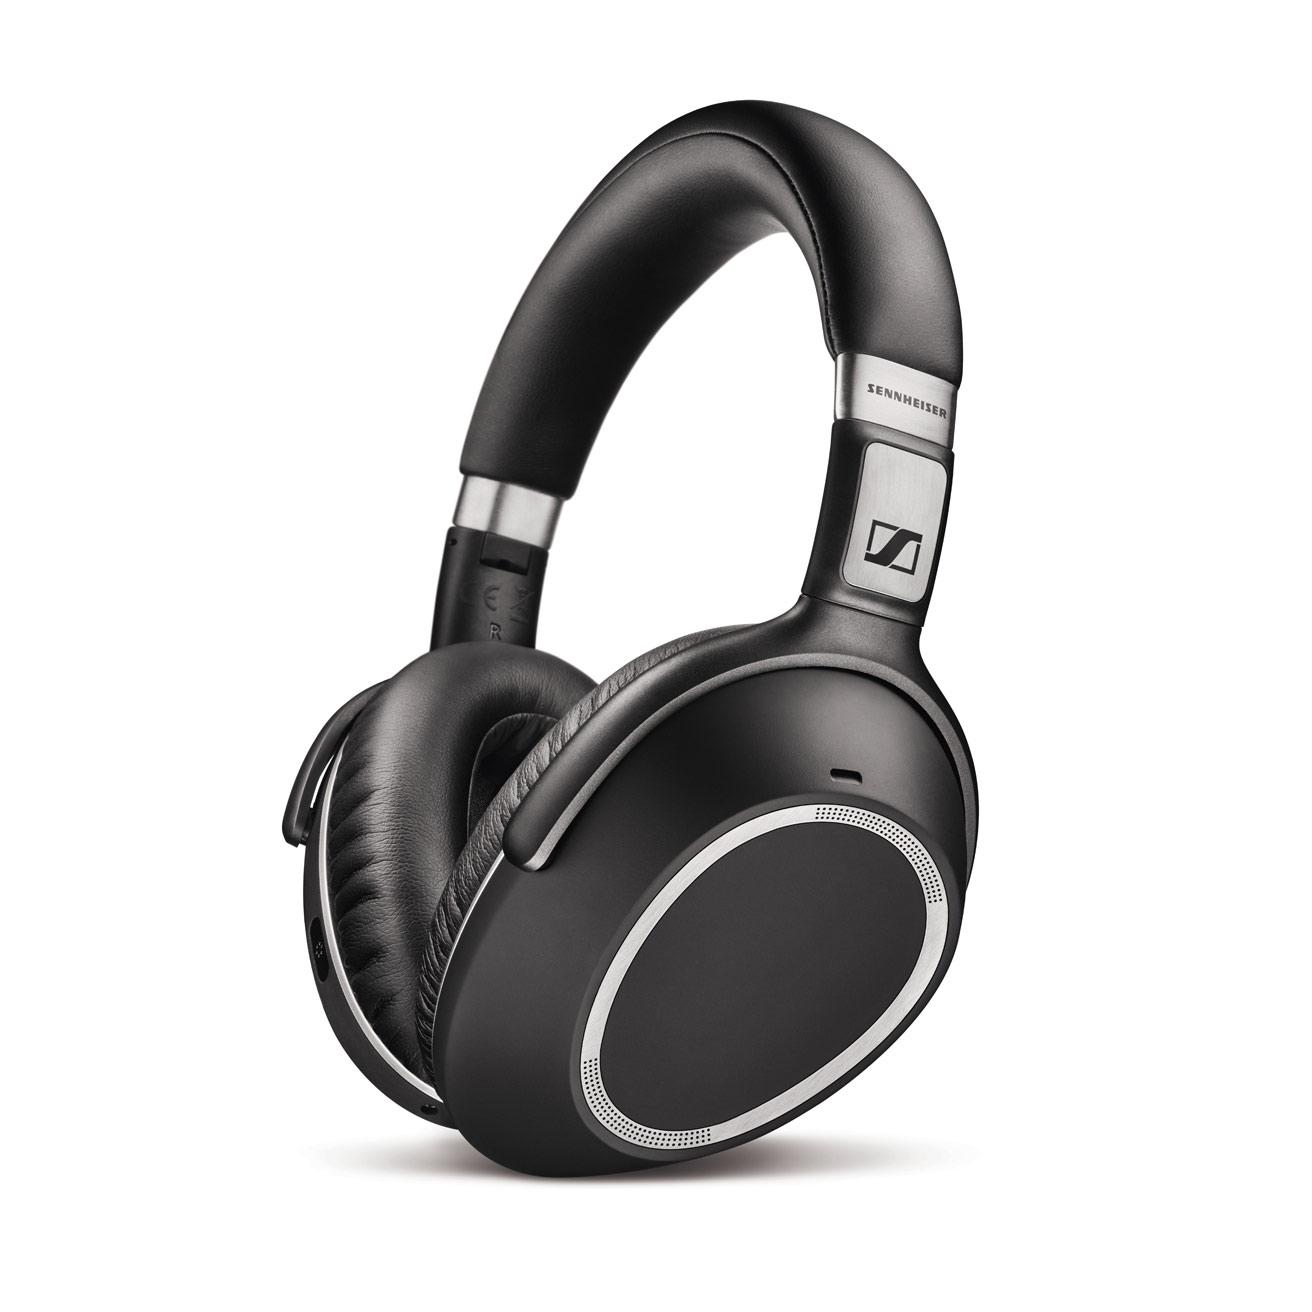 Casque sans-fil Sennheiser PXC 550 Wireless (Reconditionné - 2 Ans de Garantie) - sennheiser-outlet.com